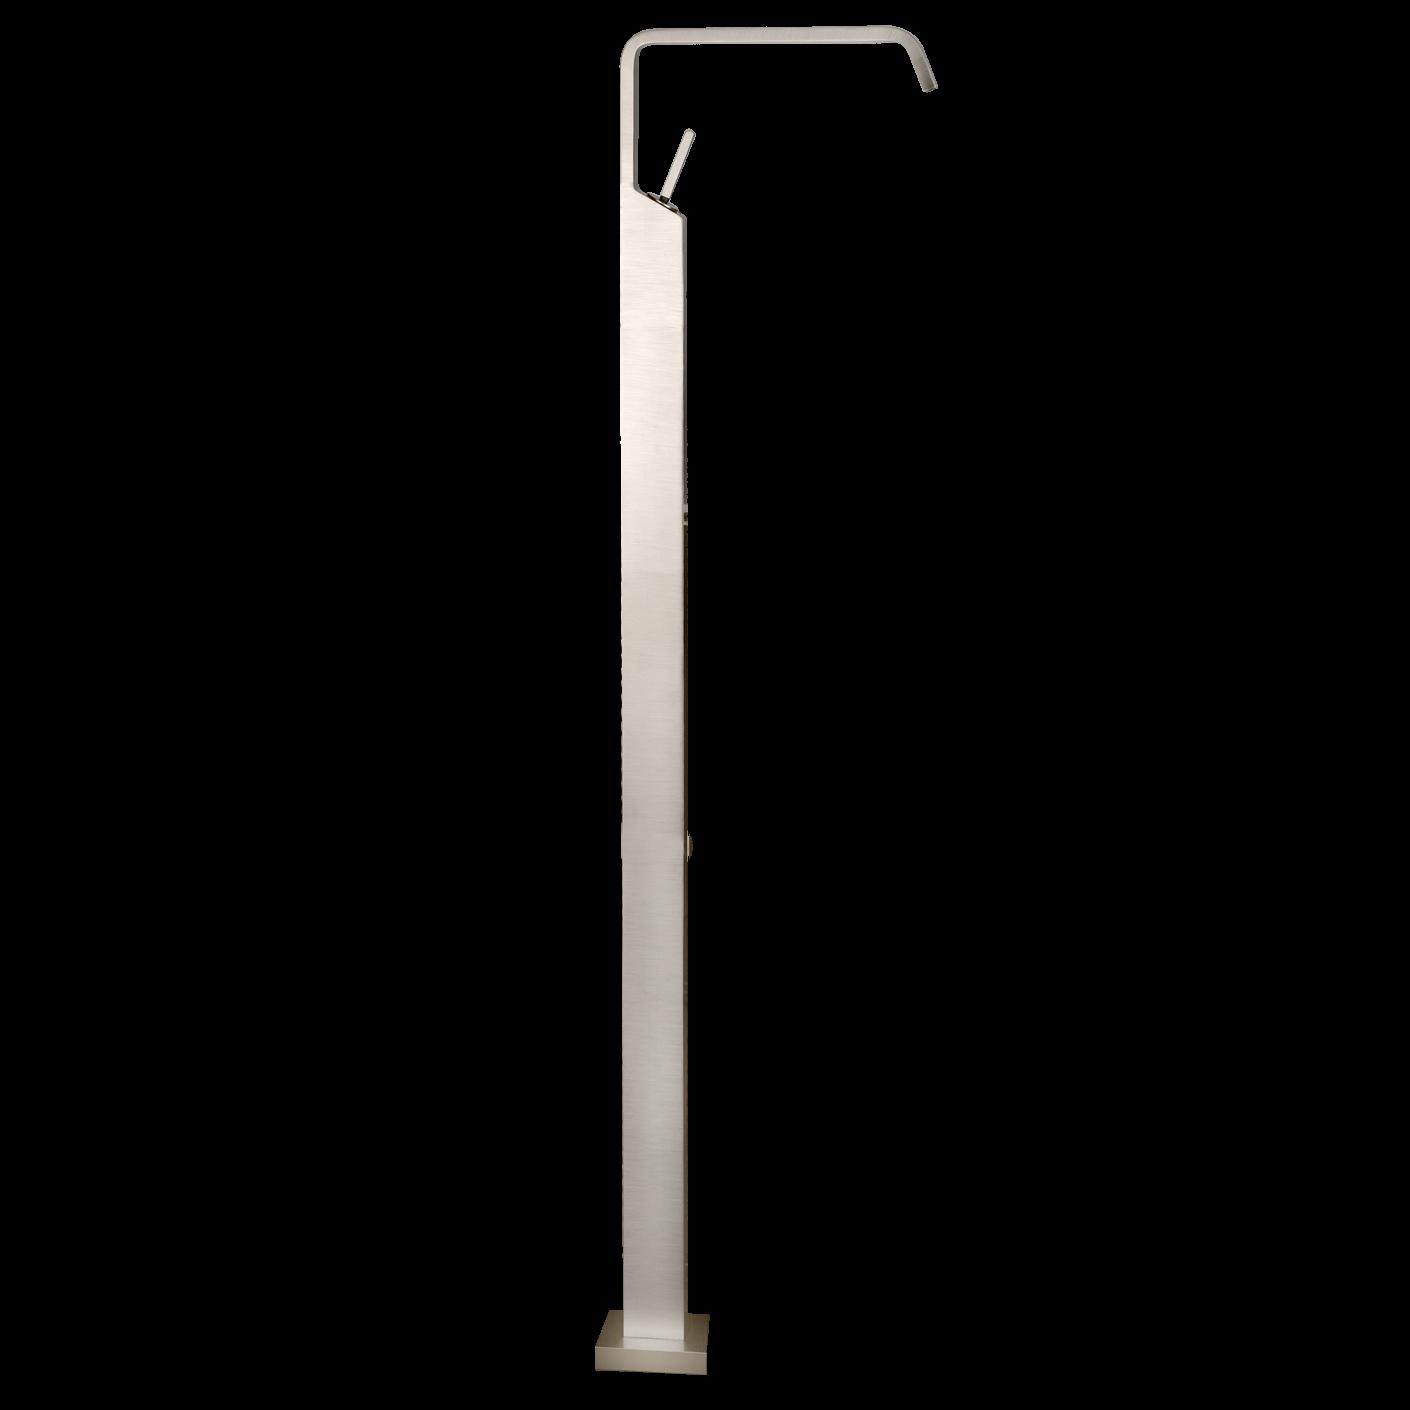 Gessi Rettangolo XL смеситель для раковины 26104 ФОТО